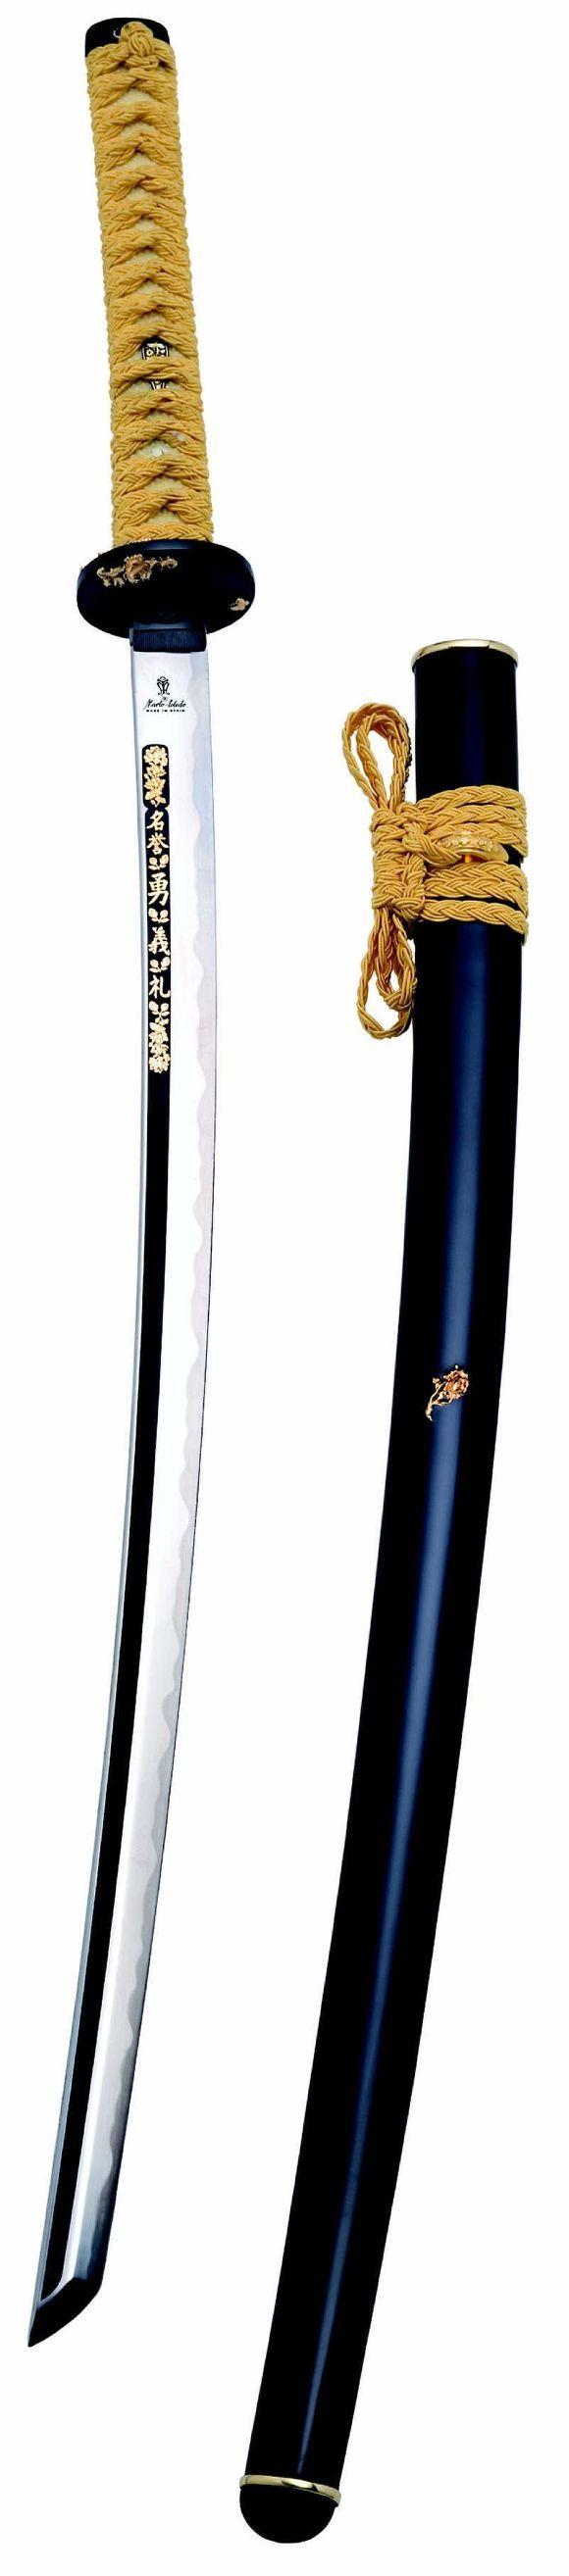 # RCMAAC0500TS Samurai Katana Sword of Kamakura by Marto of Toledo Spain - LIMITED EDITION